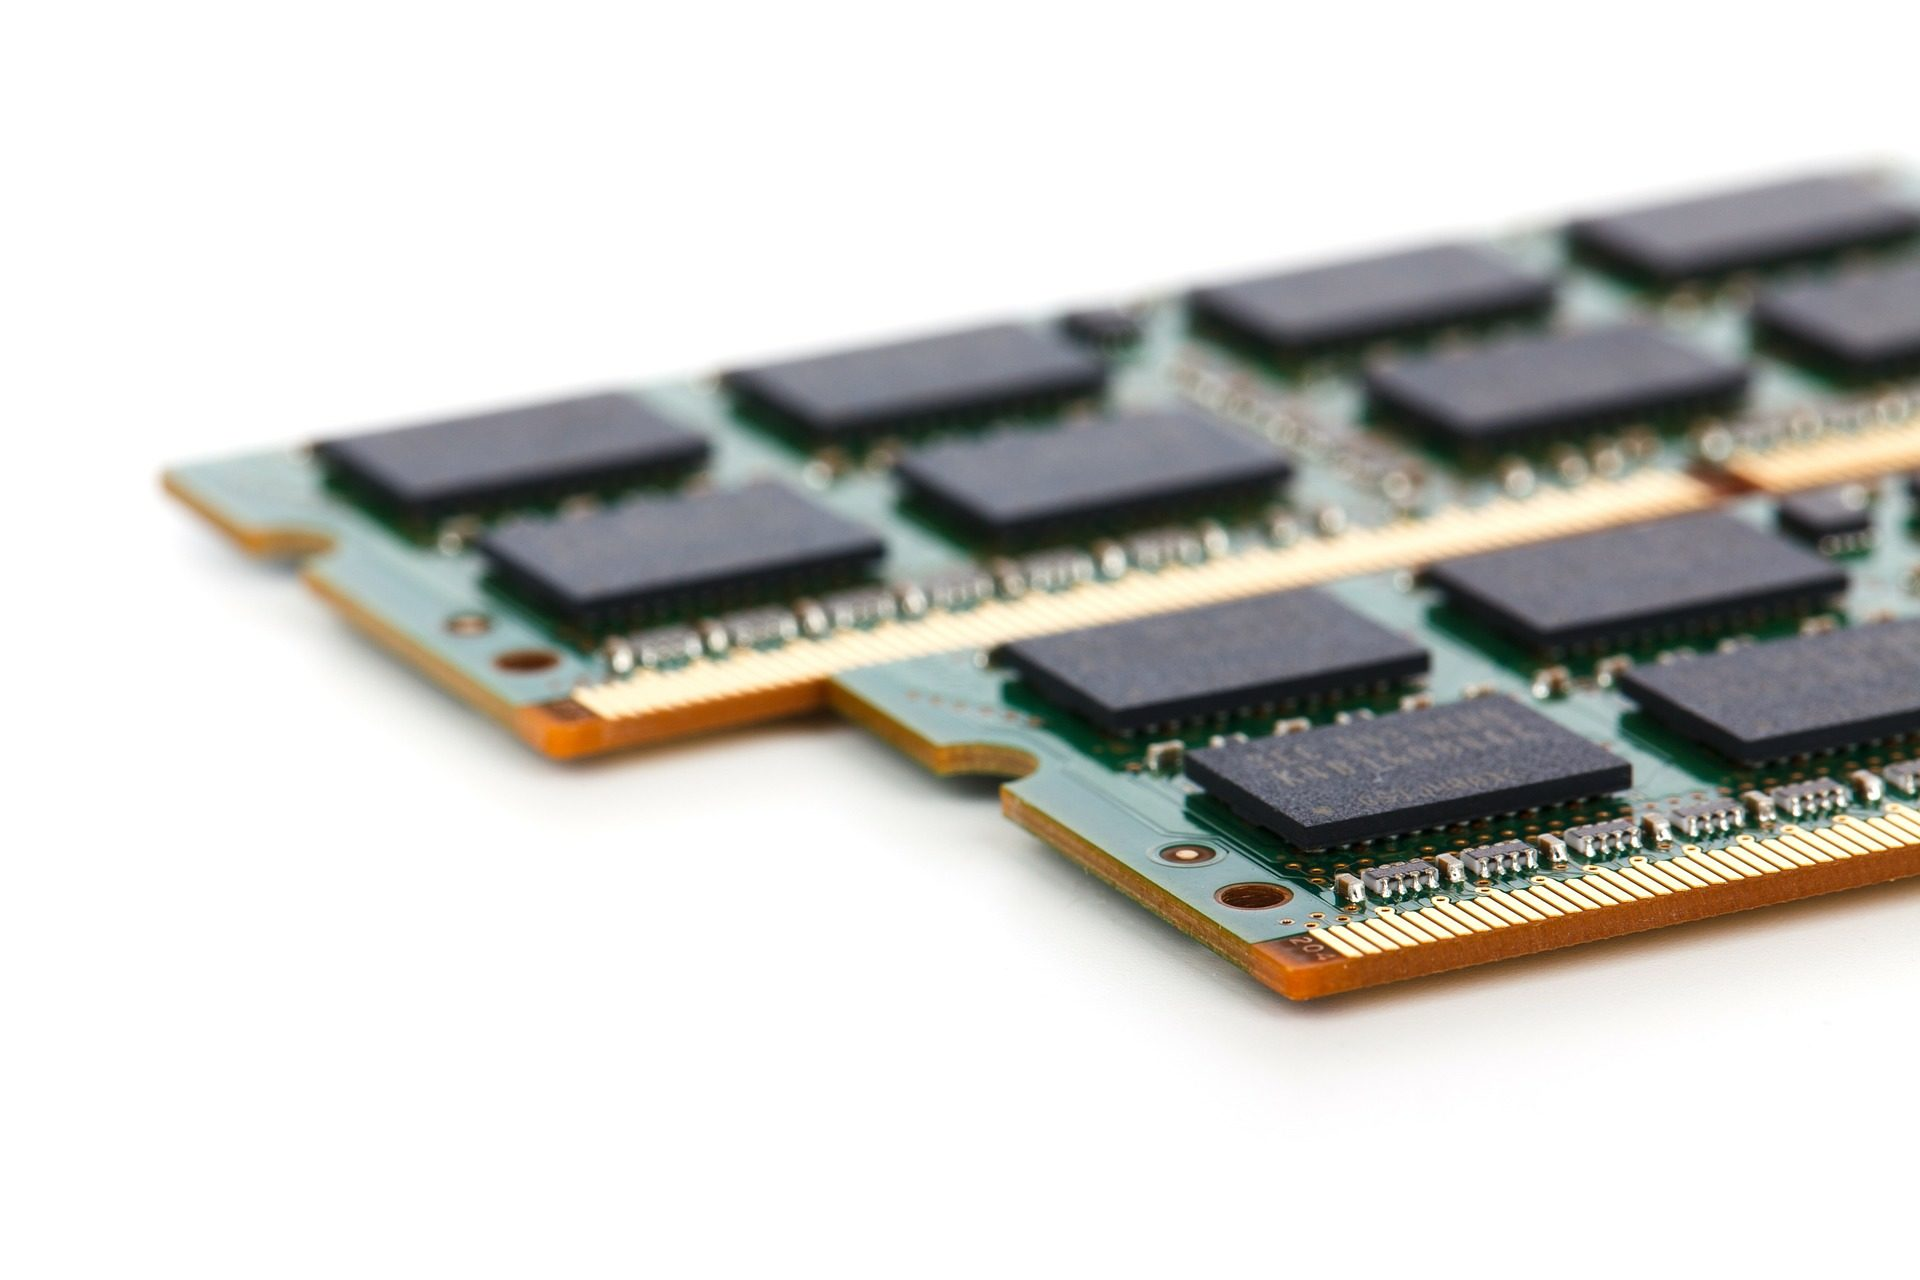 memorias, chips, tarjetas, डेटा, इलेक्ट्रॉनिक्स - HD वॉलपेपर - प्रोफेसर-falken.com